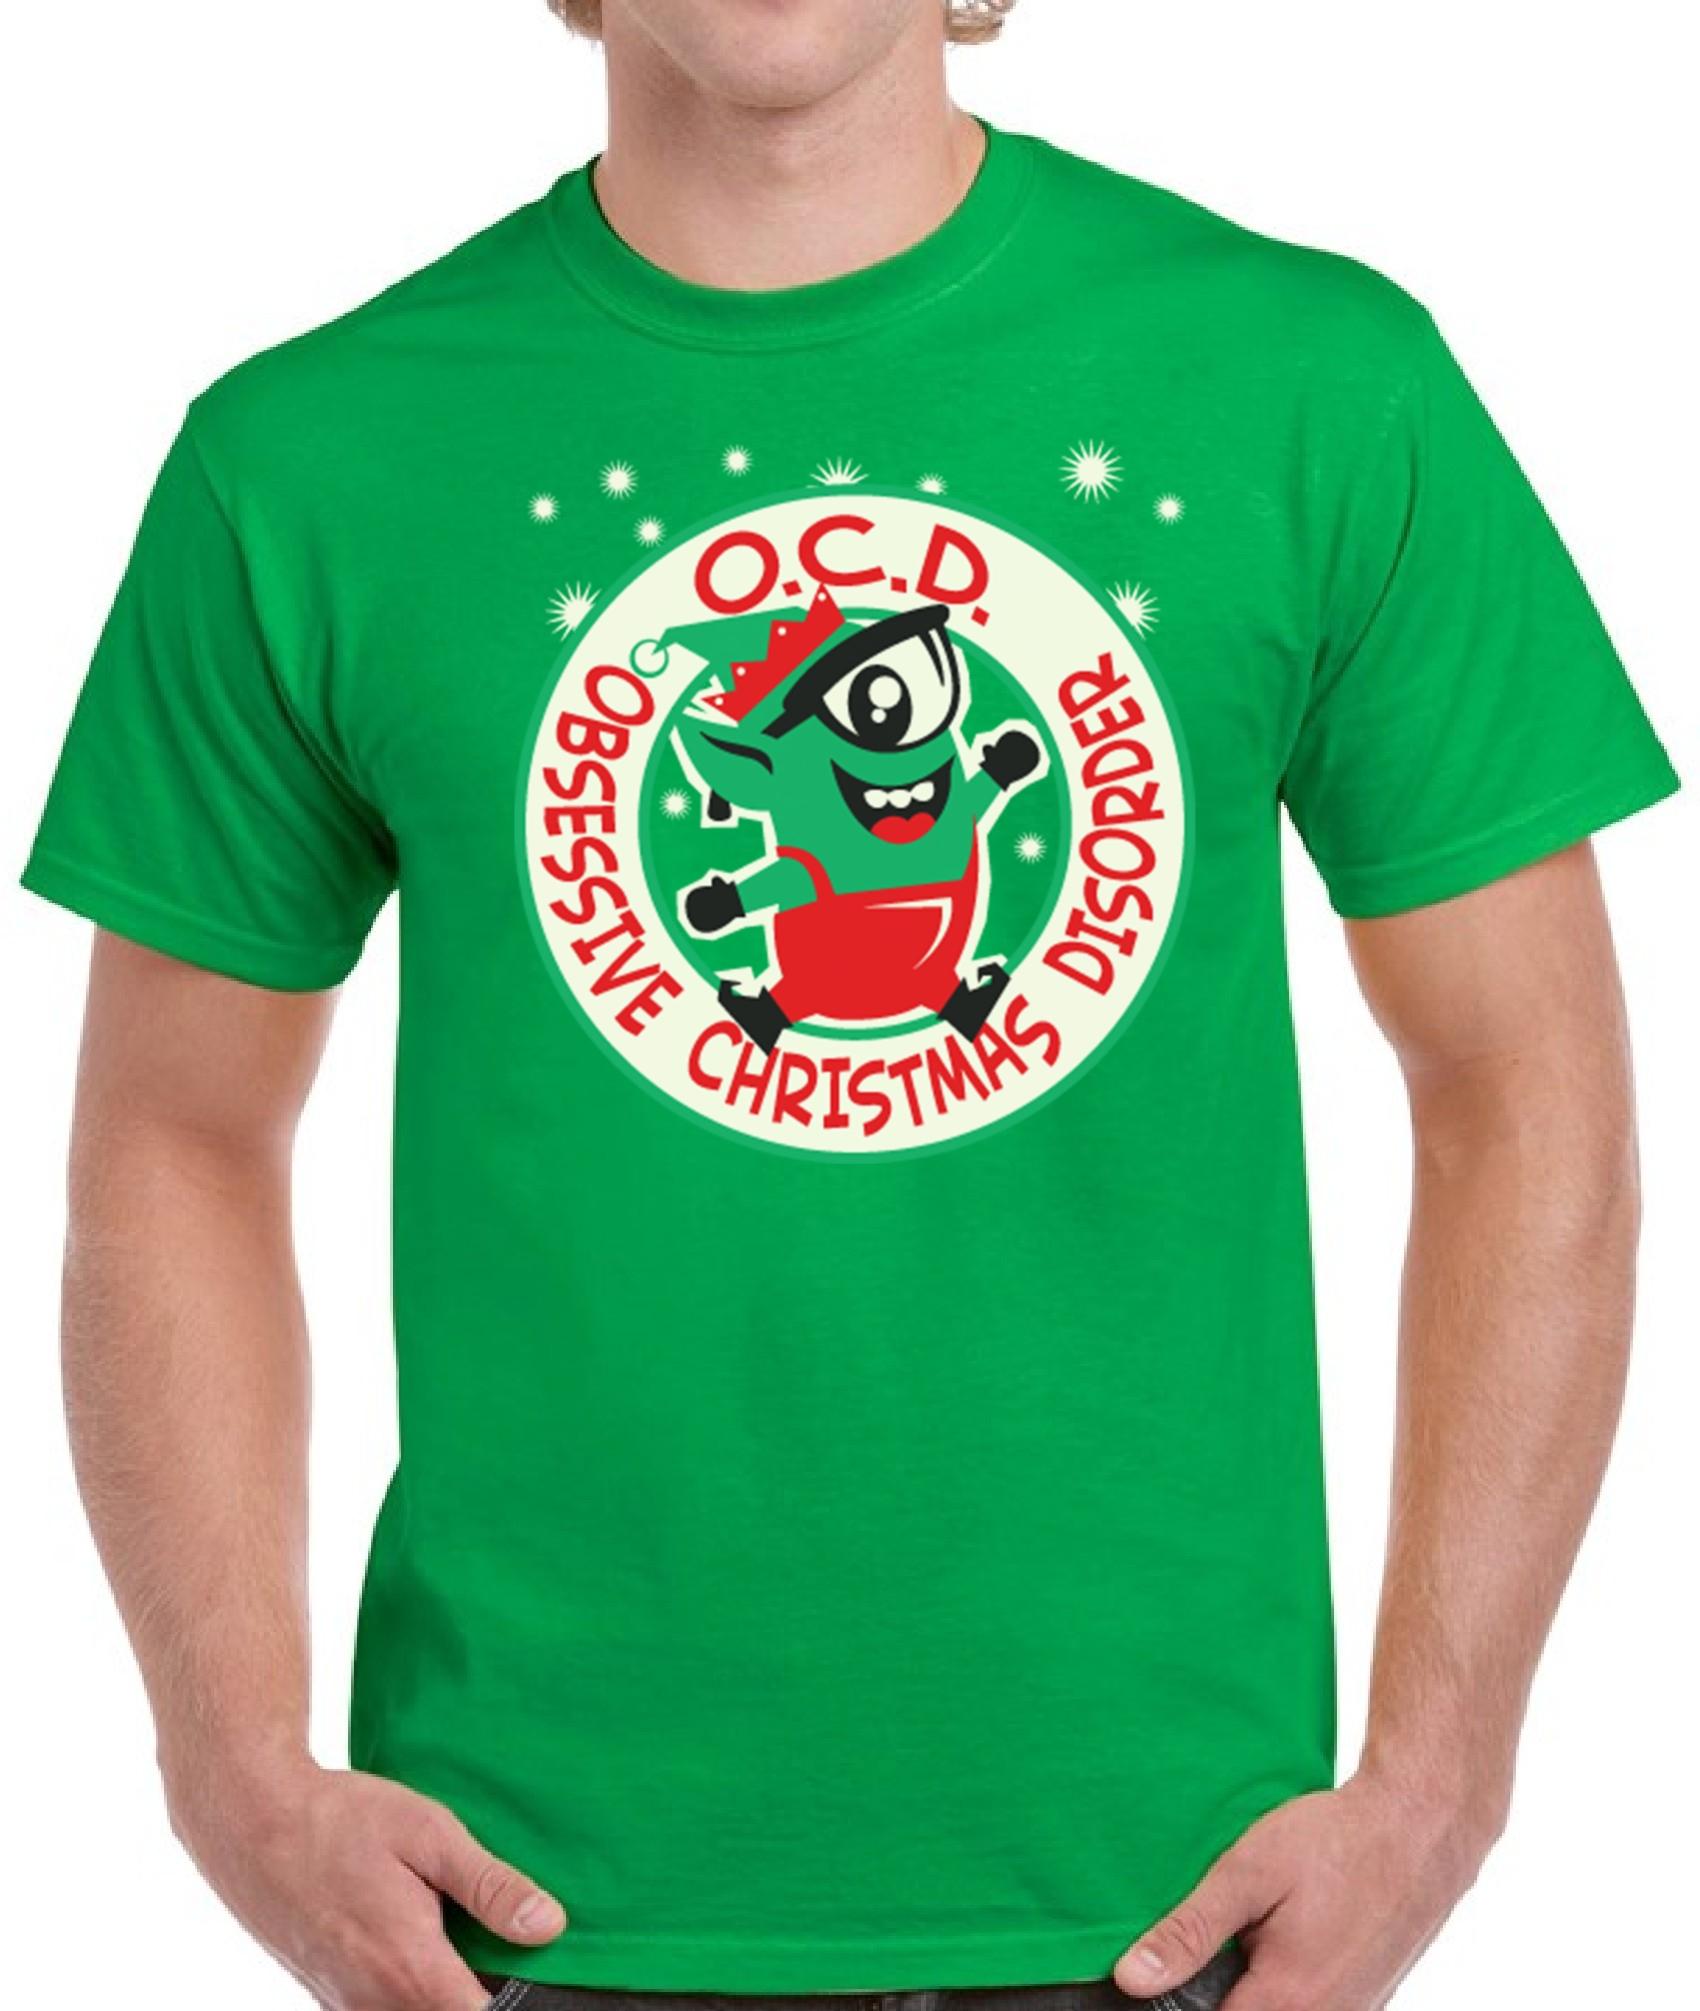 OCD Obsessive Christmas Disorder Ugly Christmas Shirt Men\'s Top for ...